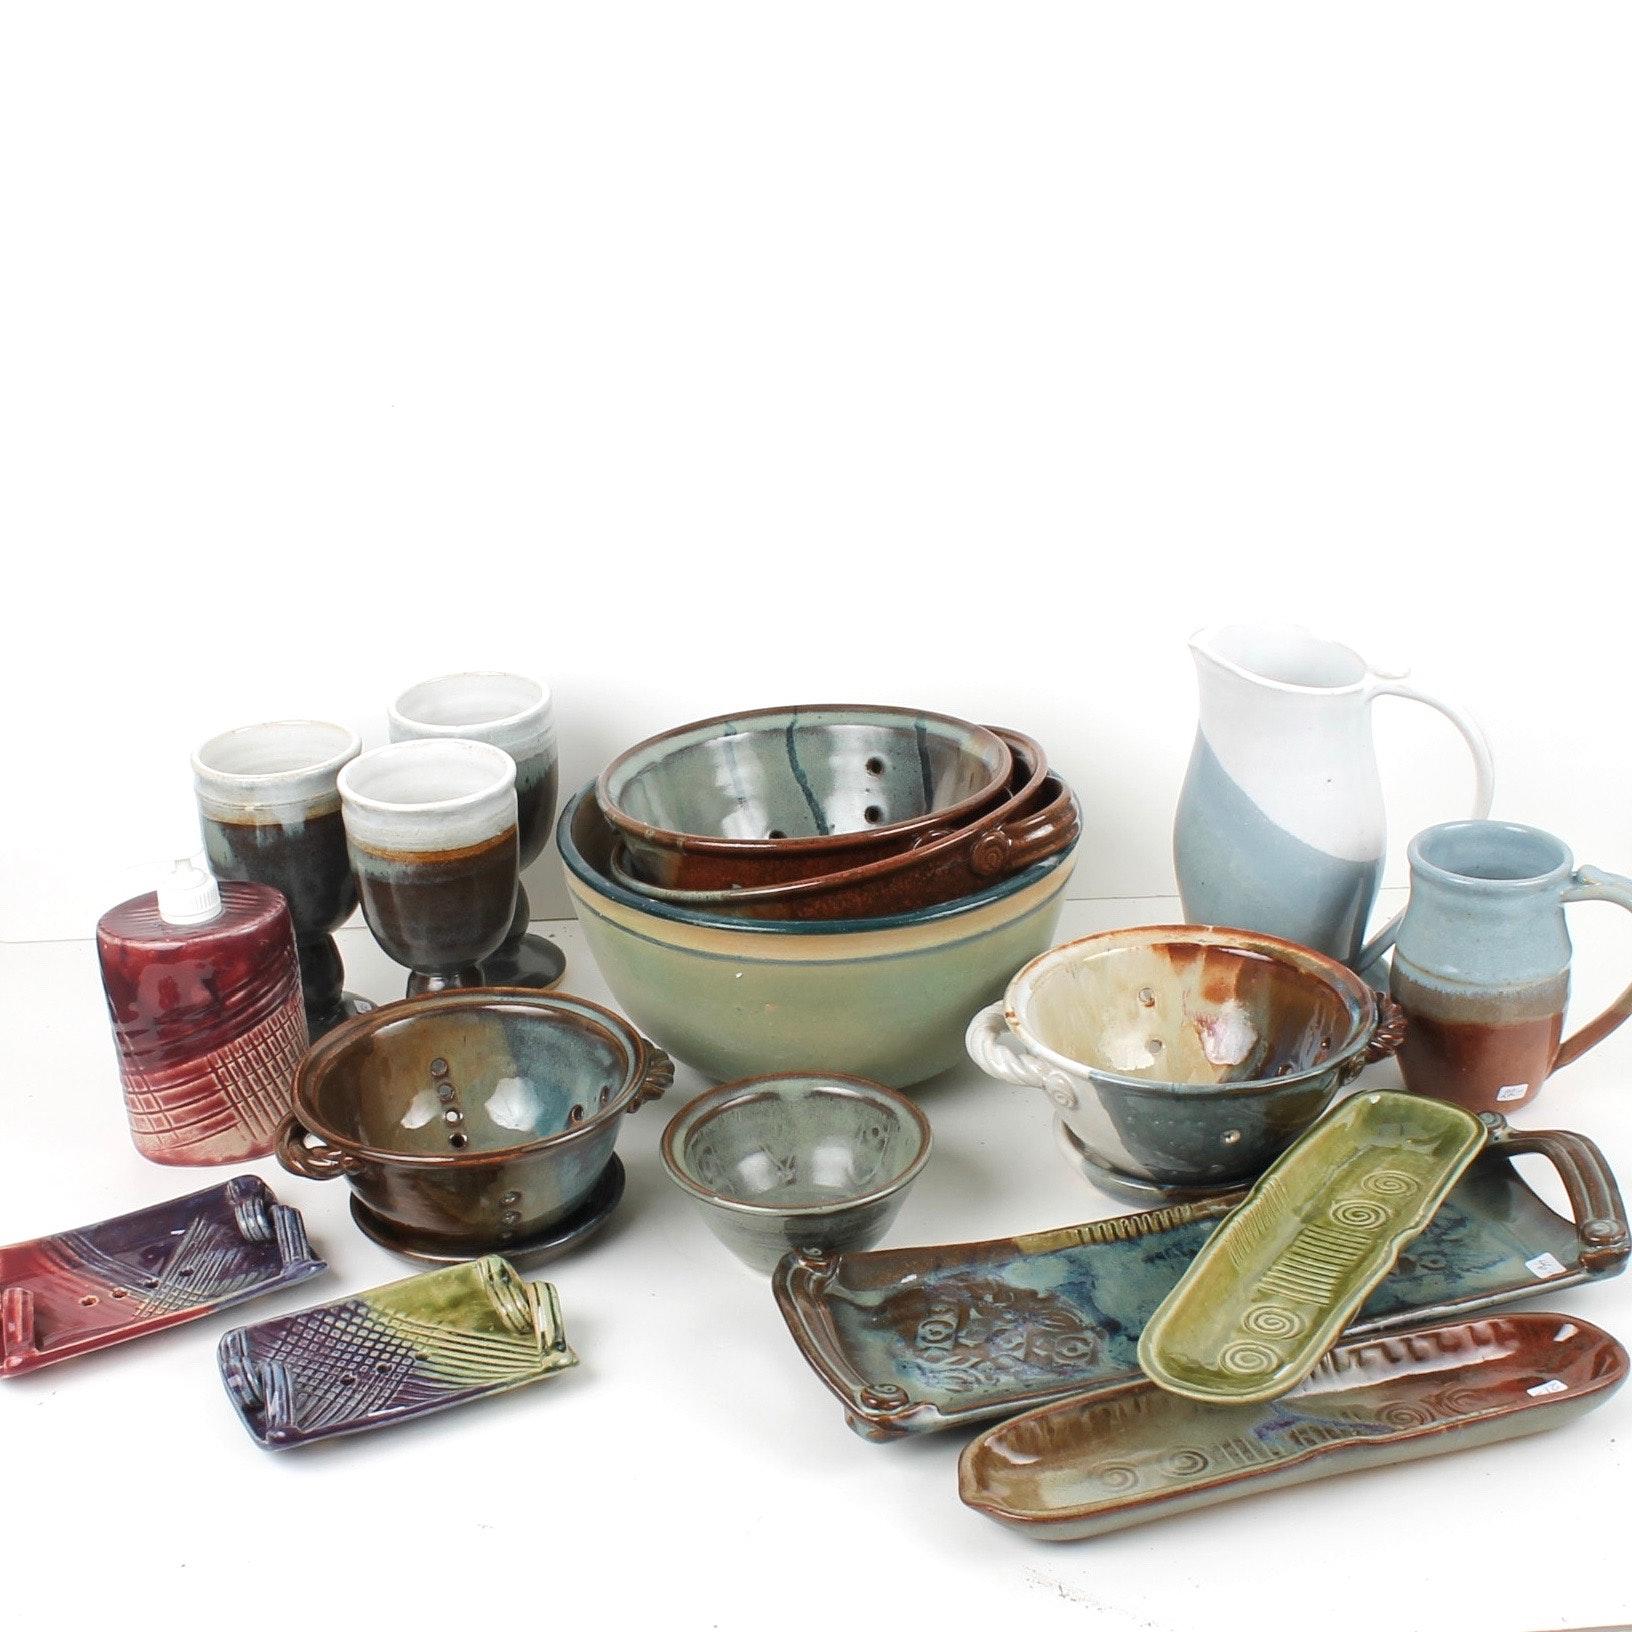 Hand Thrown Ceramic Kitchenware by Fred Borthwick